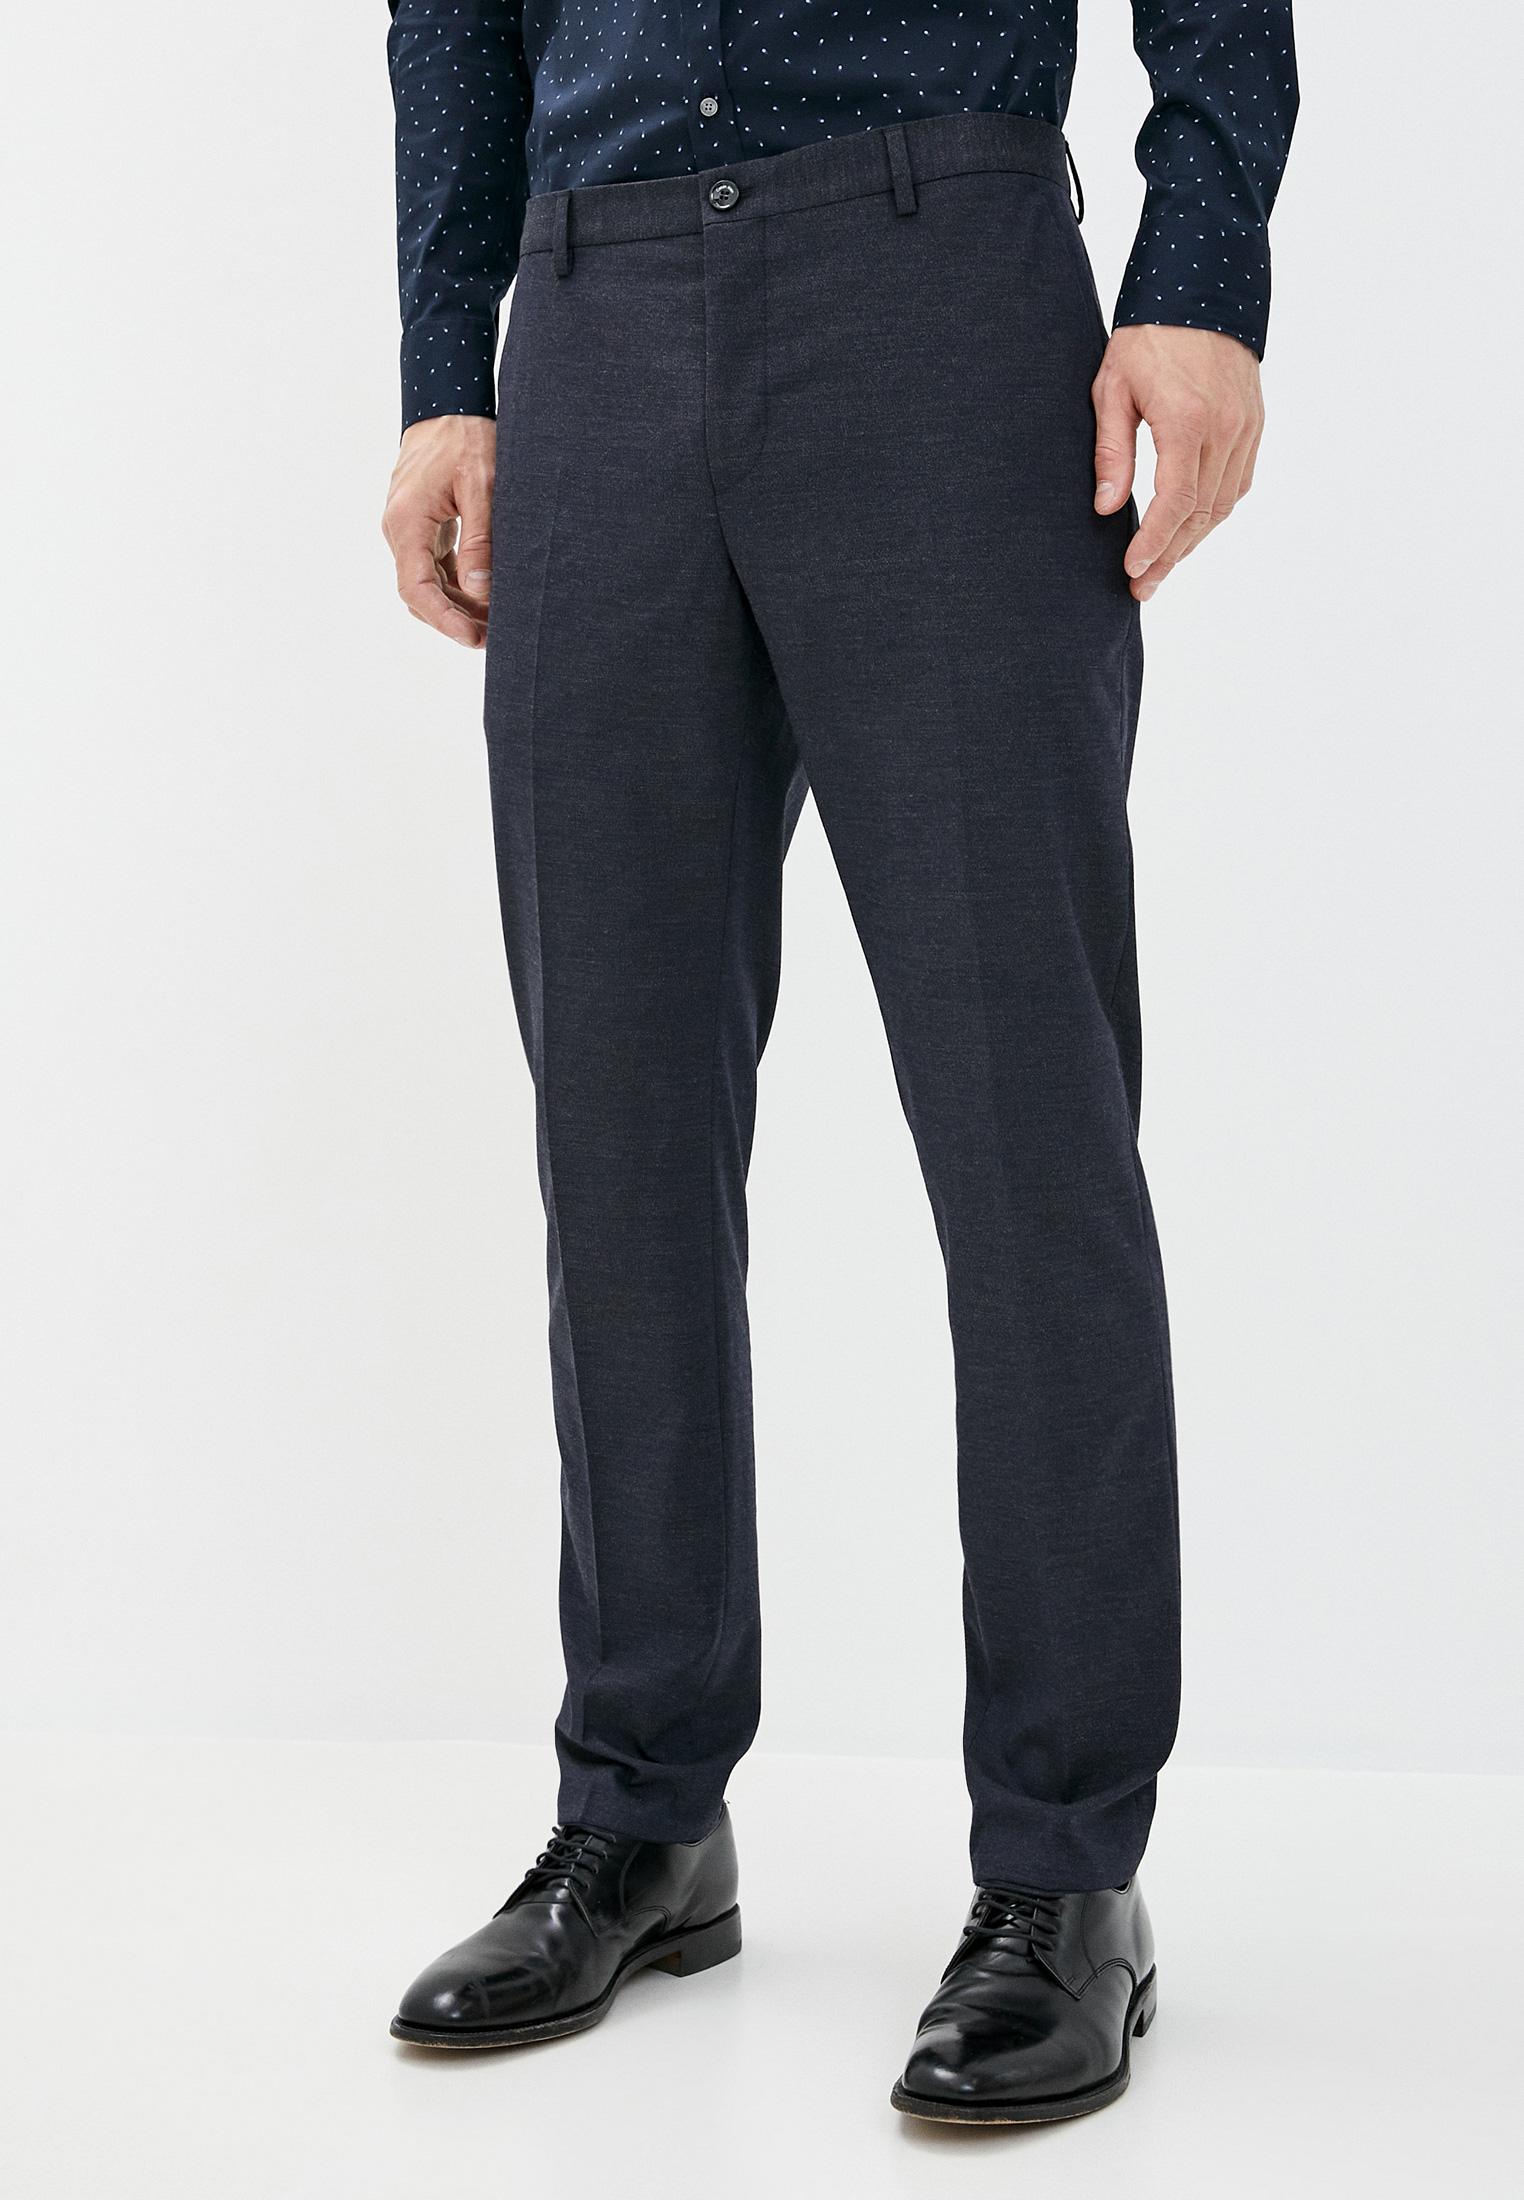 Мужские зауженные брюки Calvin Klein (Кельвин Кляйн) K10K105549